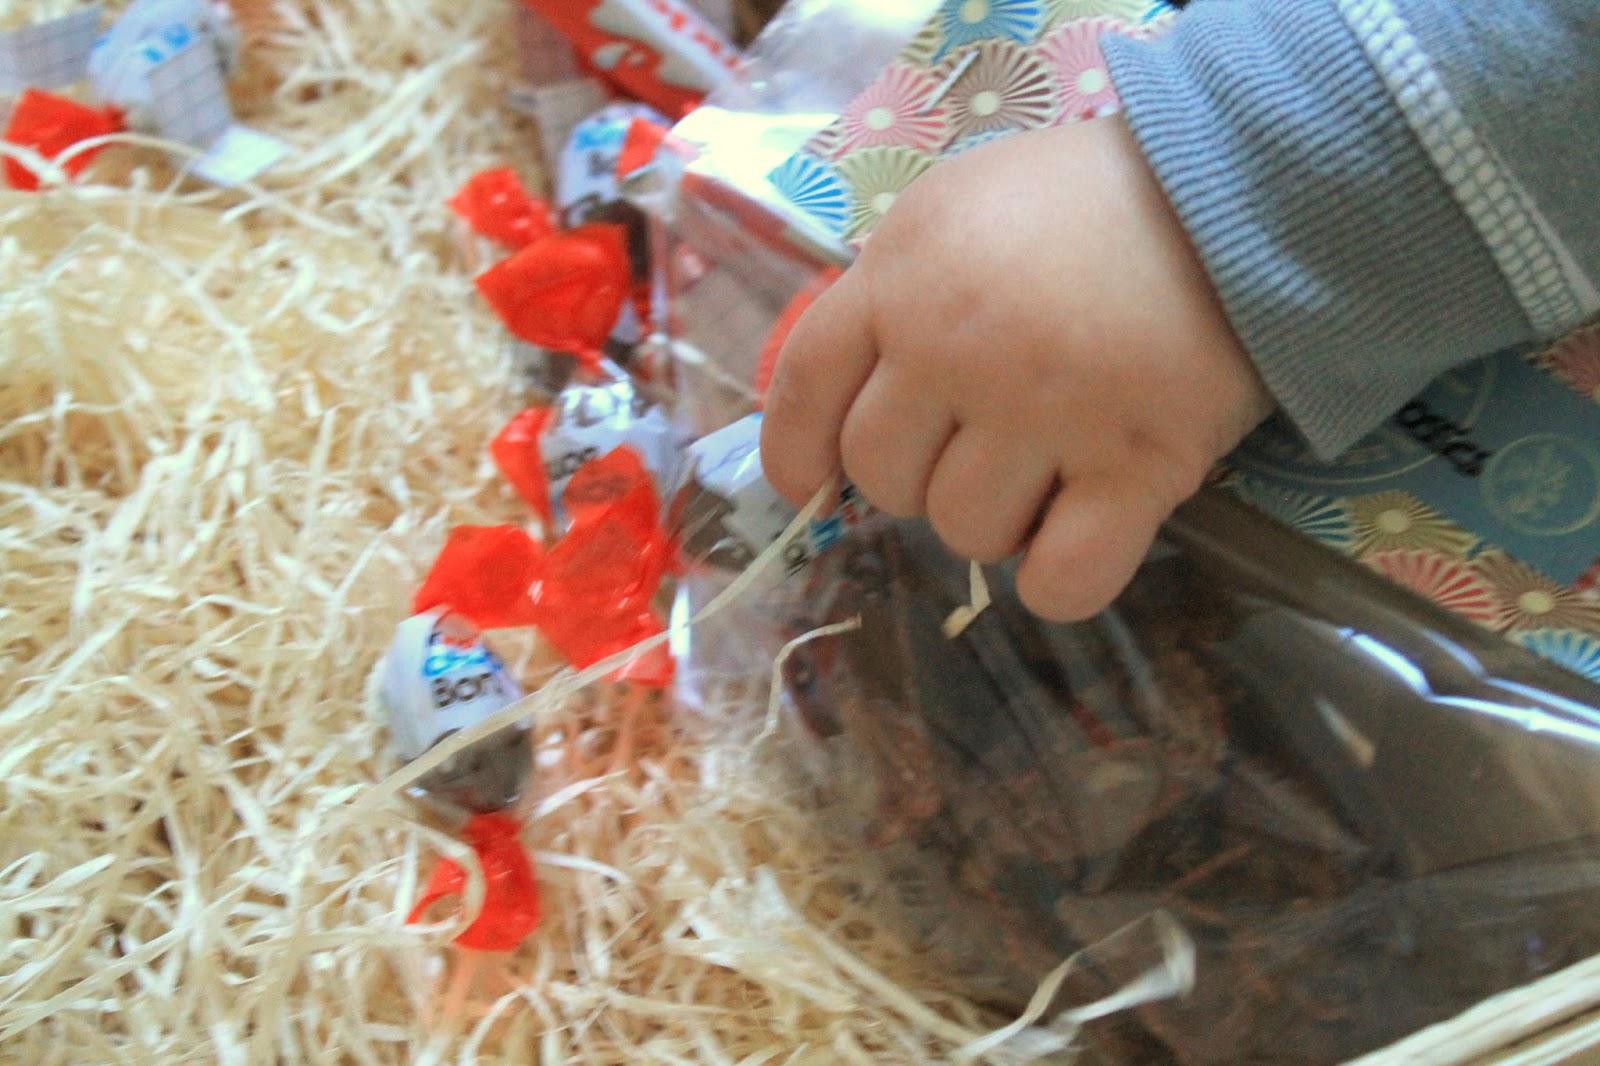 Auslosung Giveaway kinder Schokolade Muffins